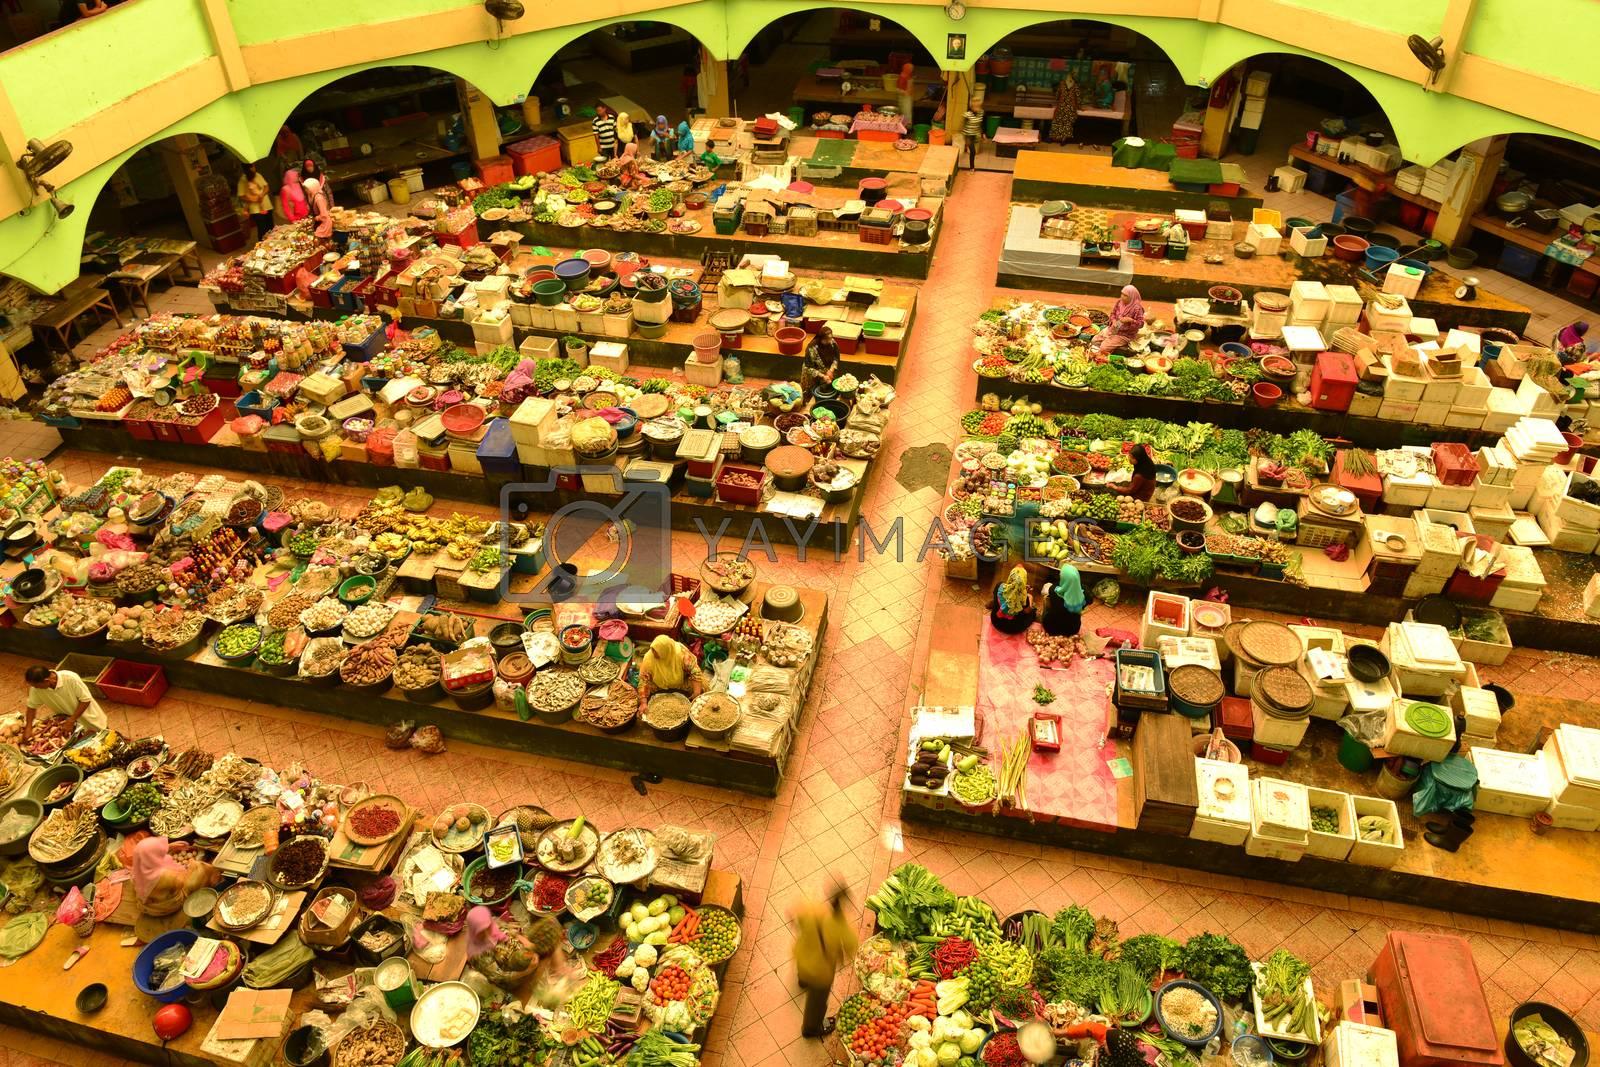 Vegetable market in Kota Bharu, Pasar Siti Khadijah Kelantan, Malaysia, Asia.